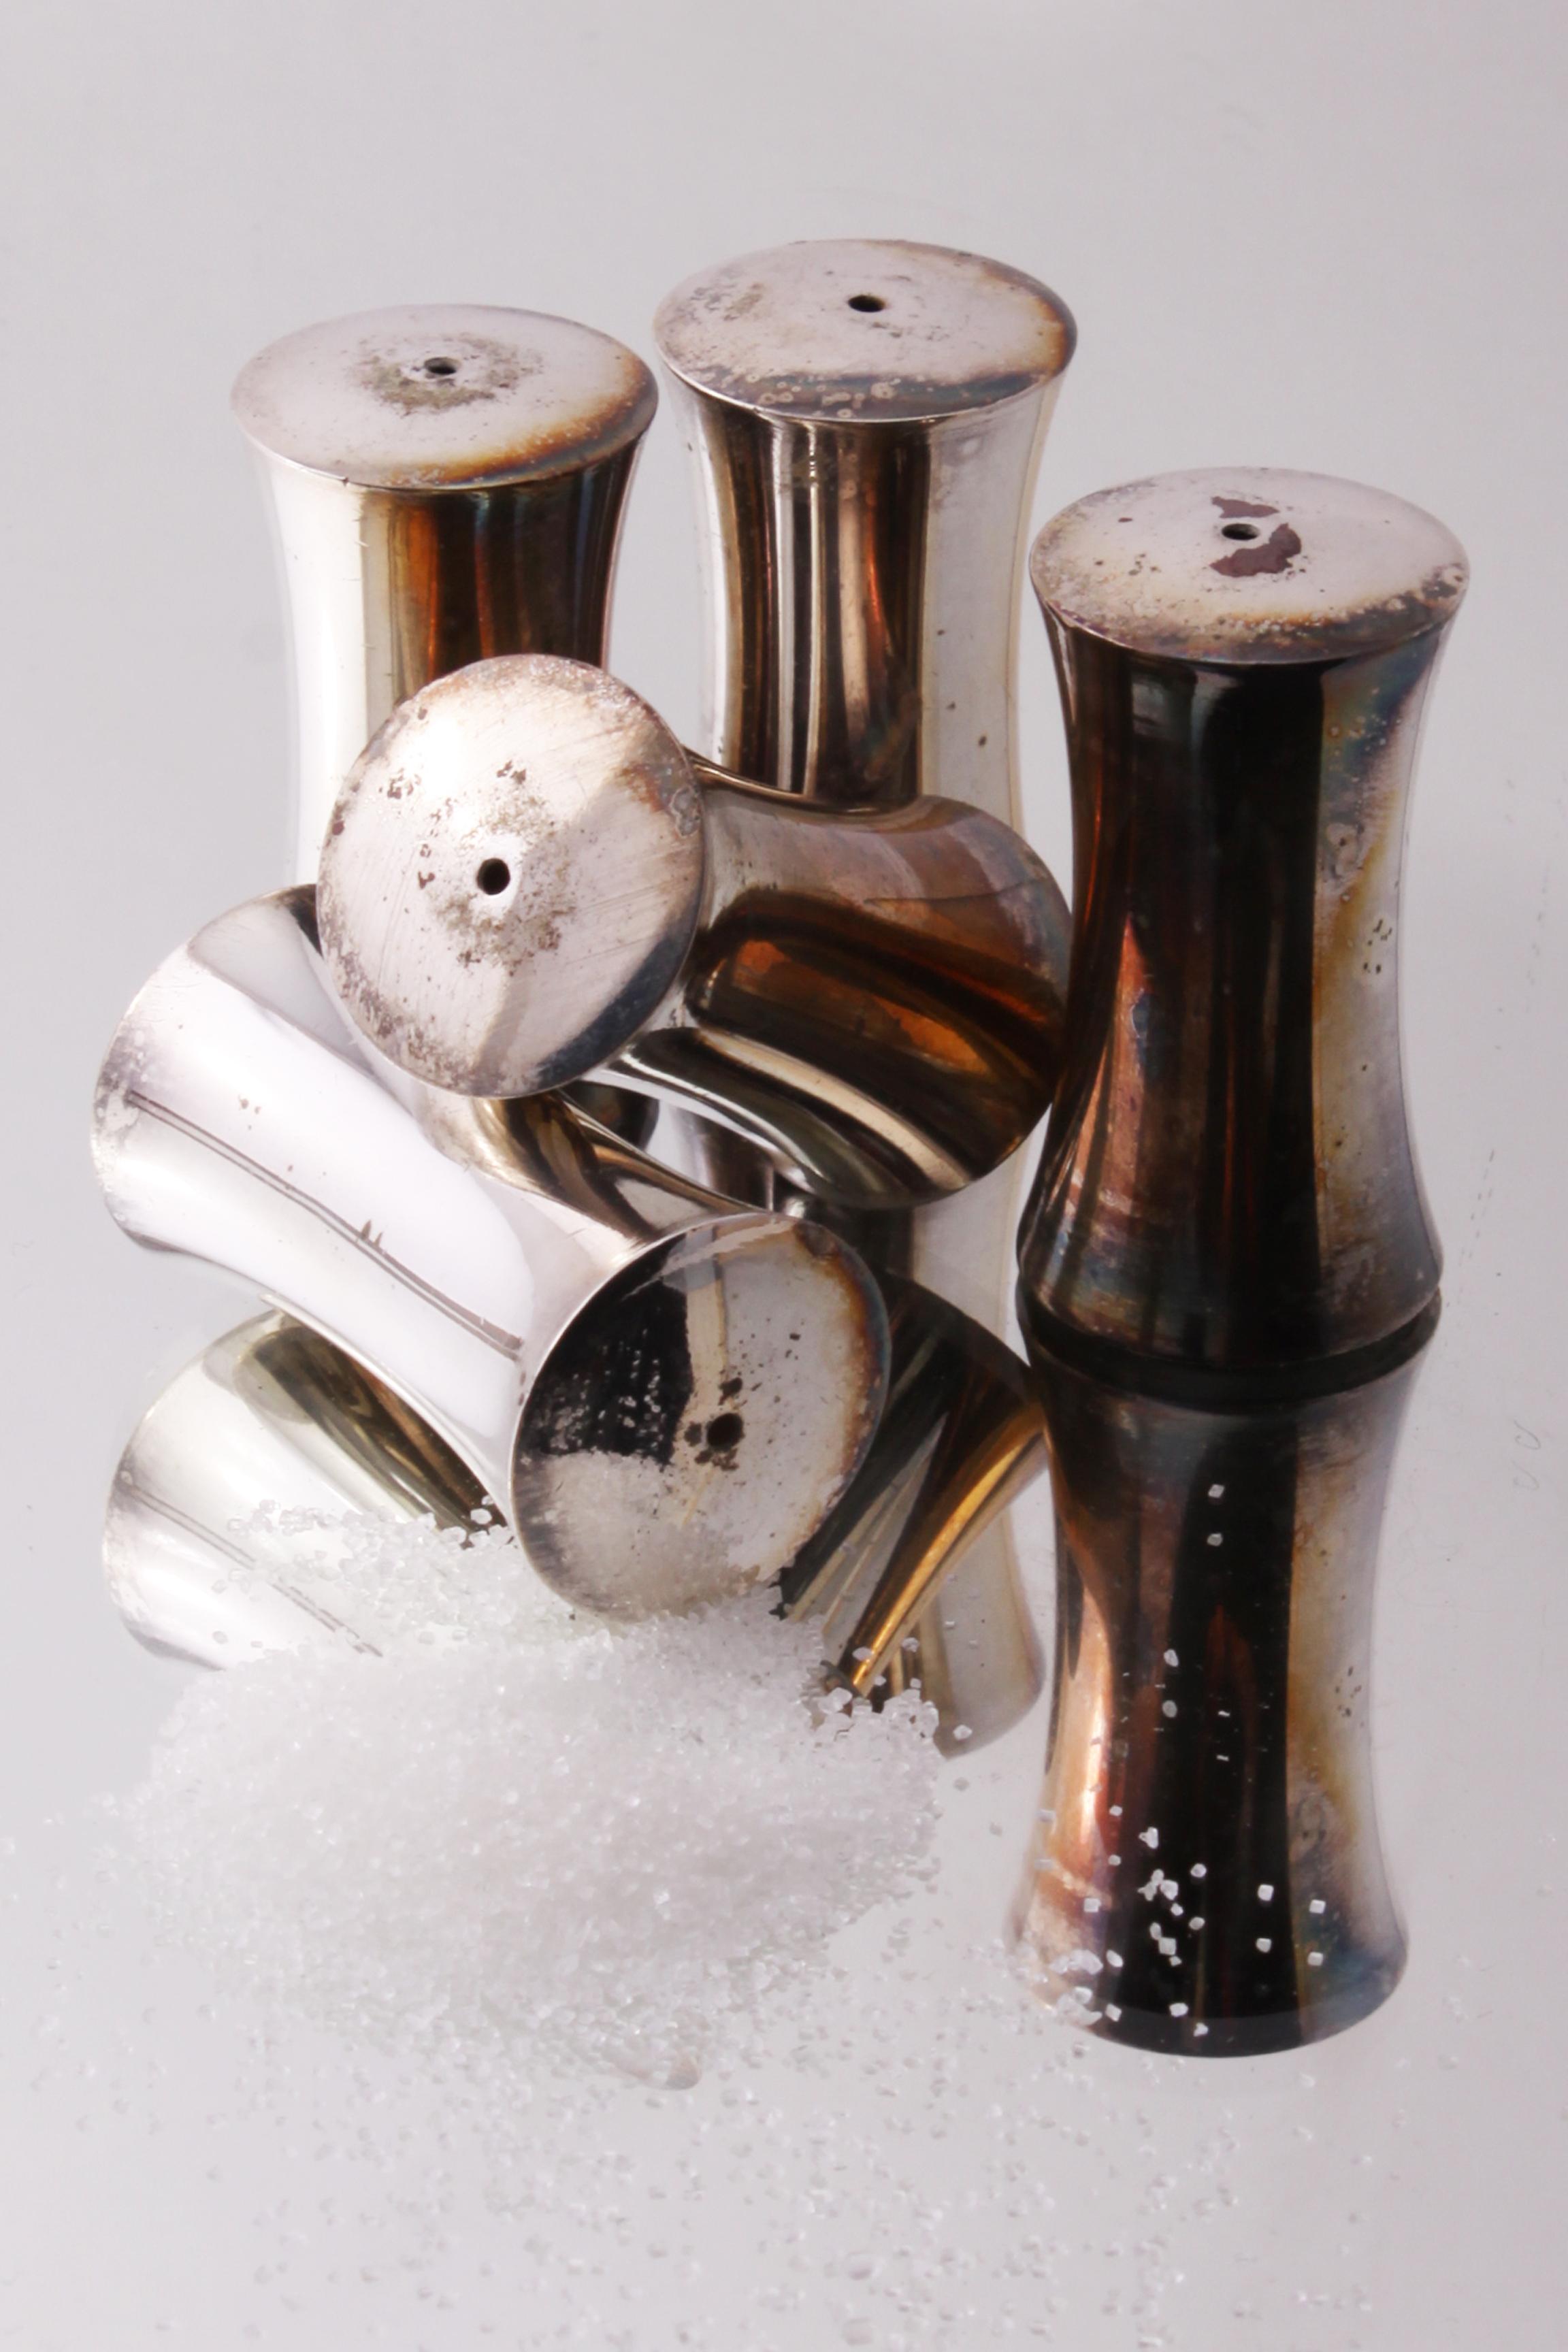 Grain of salt, Shine, Salt, Silver, Reflection, HQ Photo